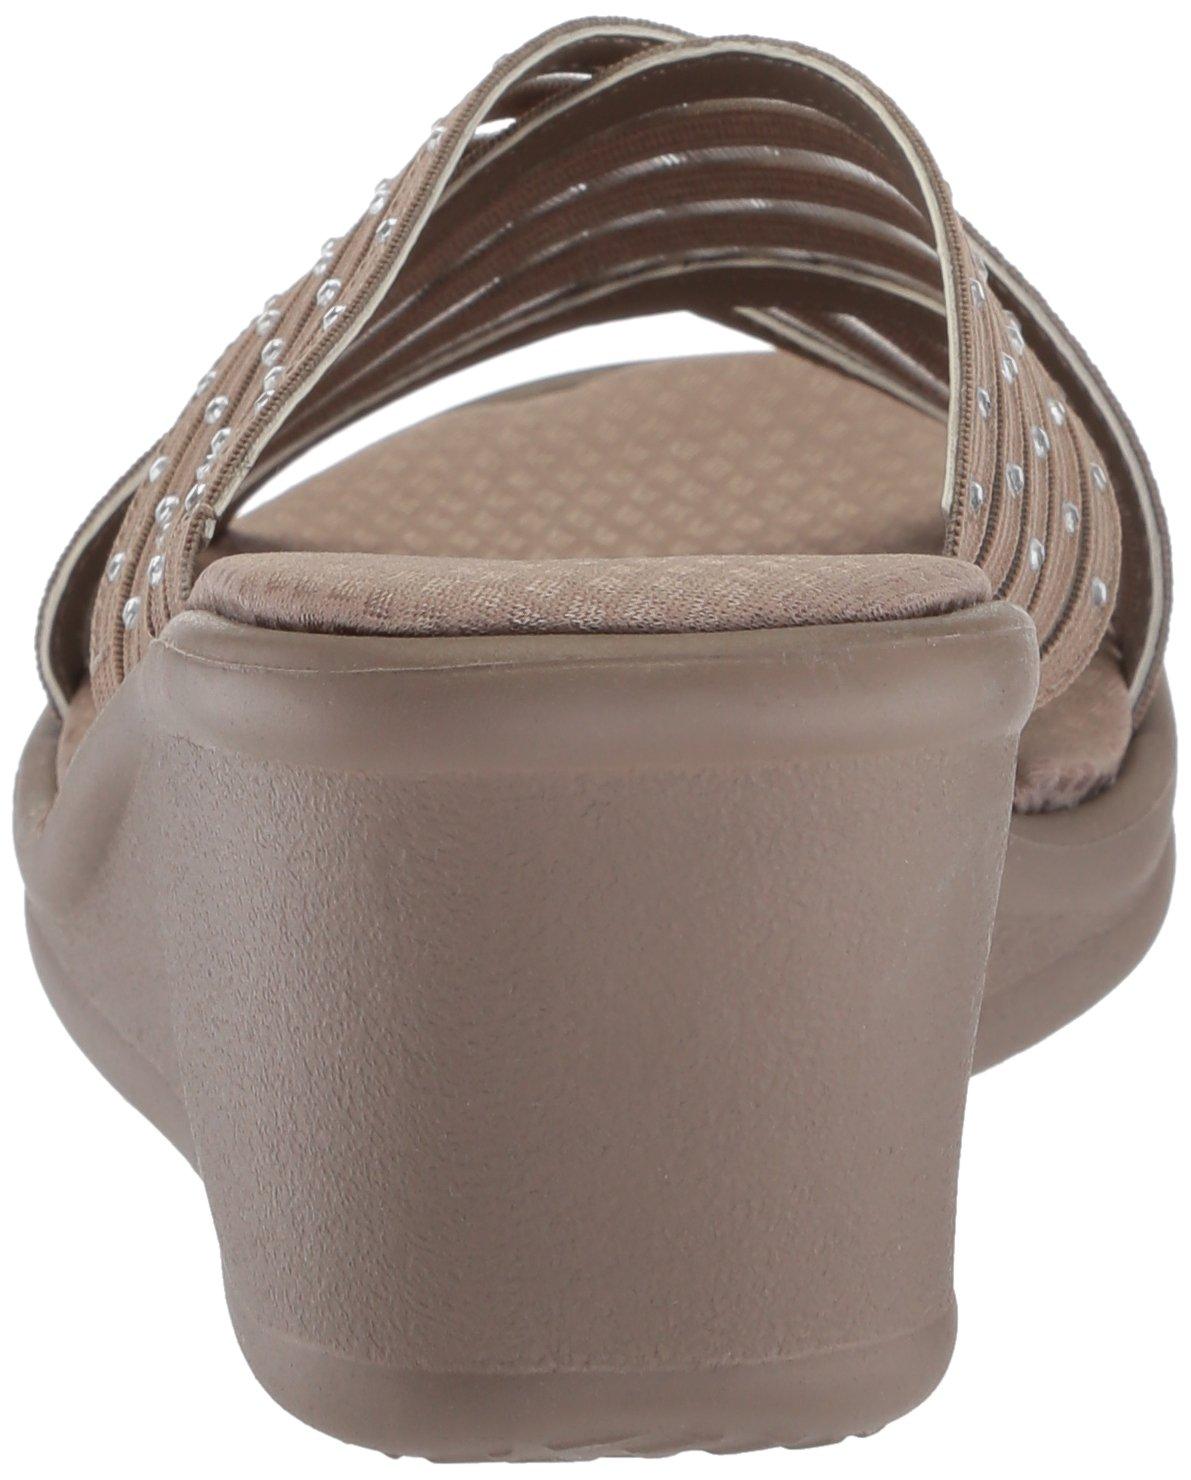 19b6f21381ee5 Skechers Rumblers-Flashies Sandalia deslizante para mujer Gris pardo